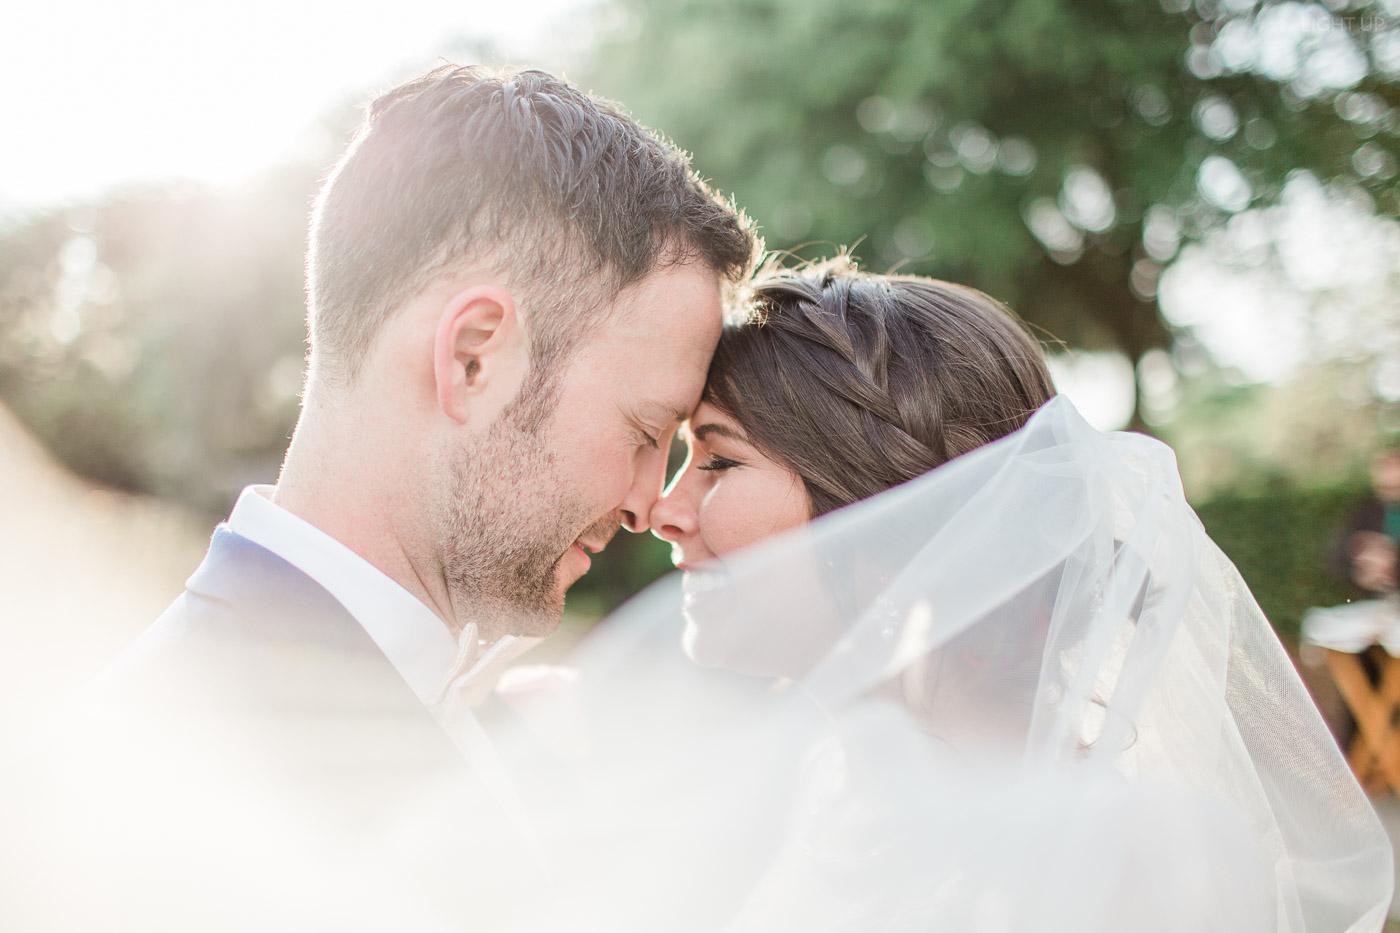 hstoric-dubsdread-wedding-orlando-25.jpg